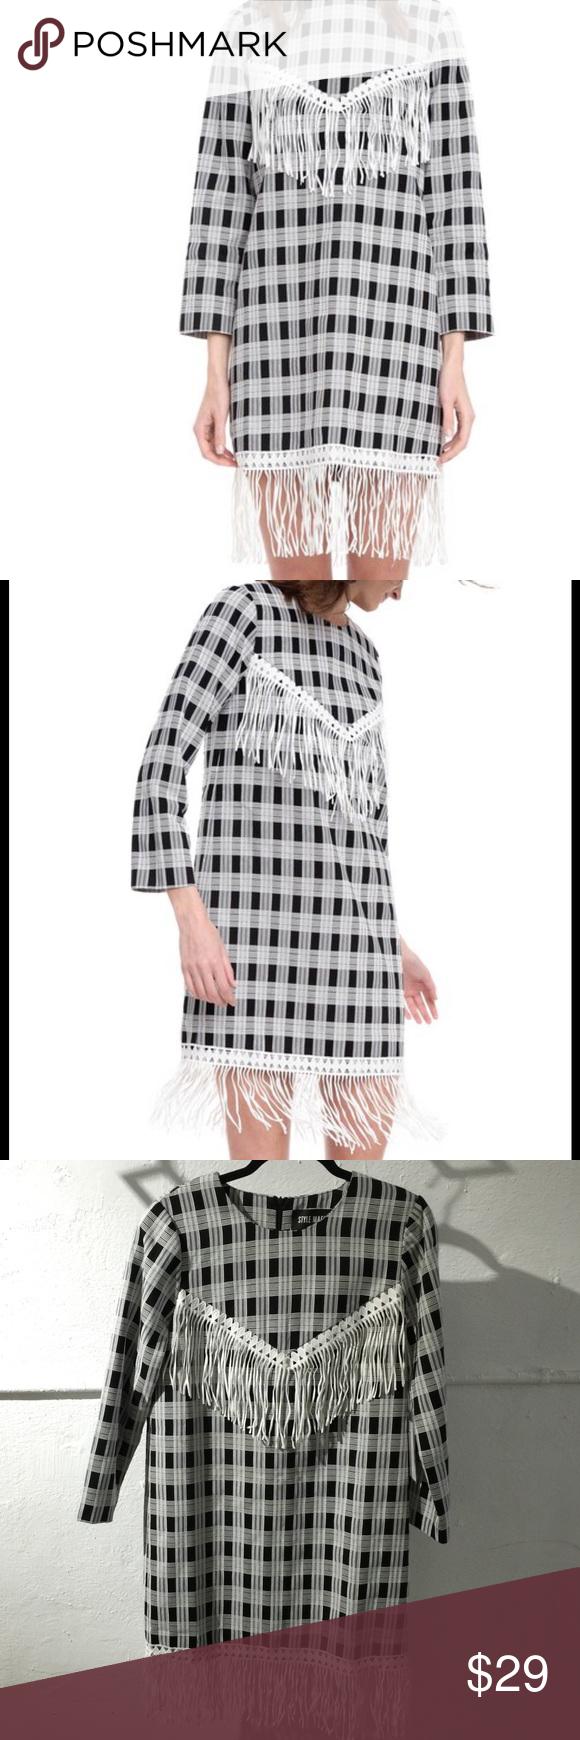 Graphic print midi dress Black and white long sleeve, graphic print midi dress with white fringe on hem and front detail. Zipper on back. Style Mafia Dresses Midi